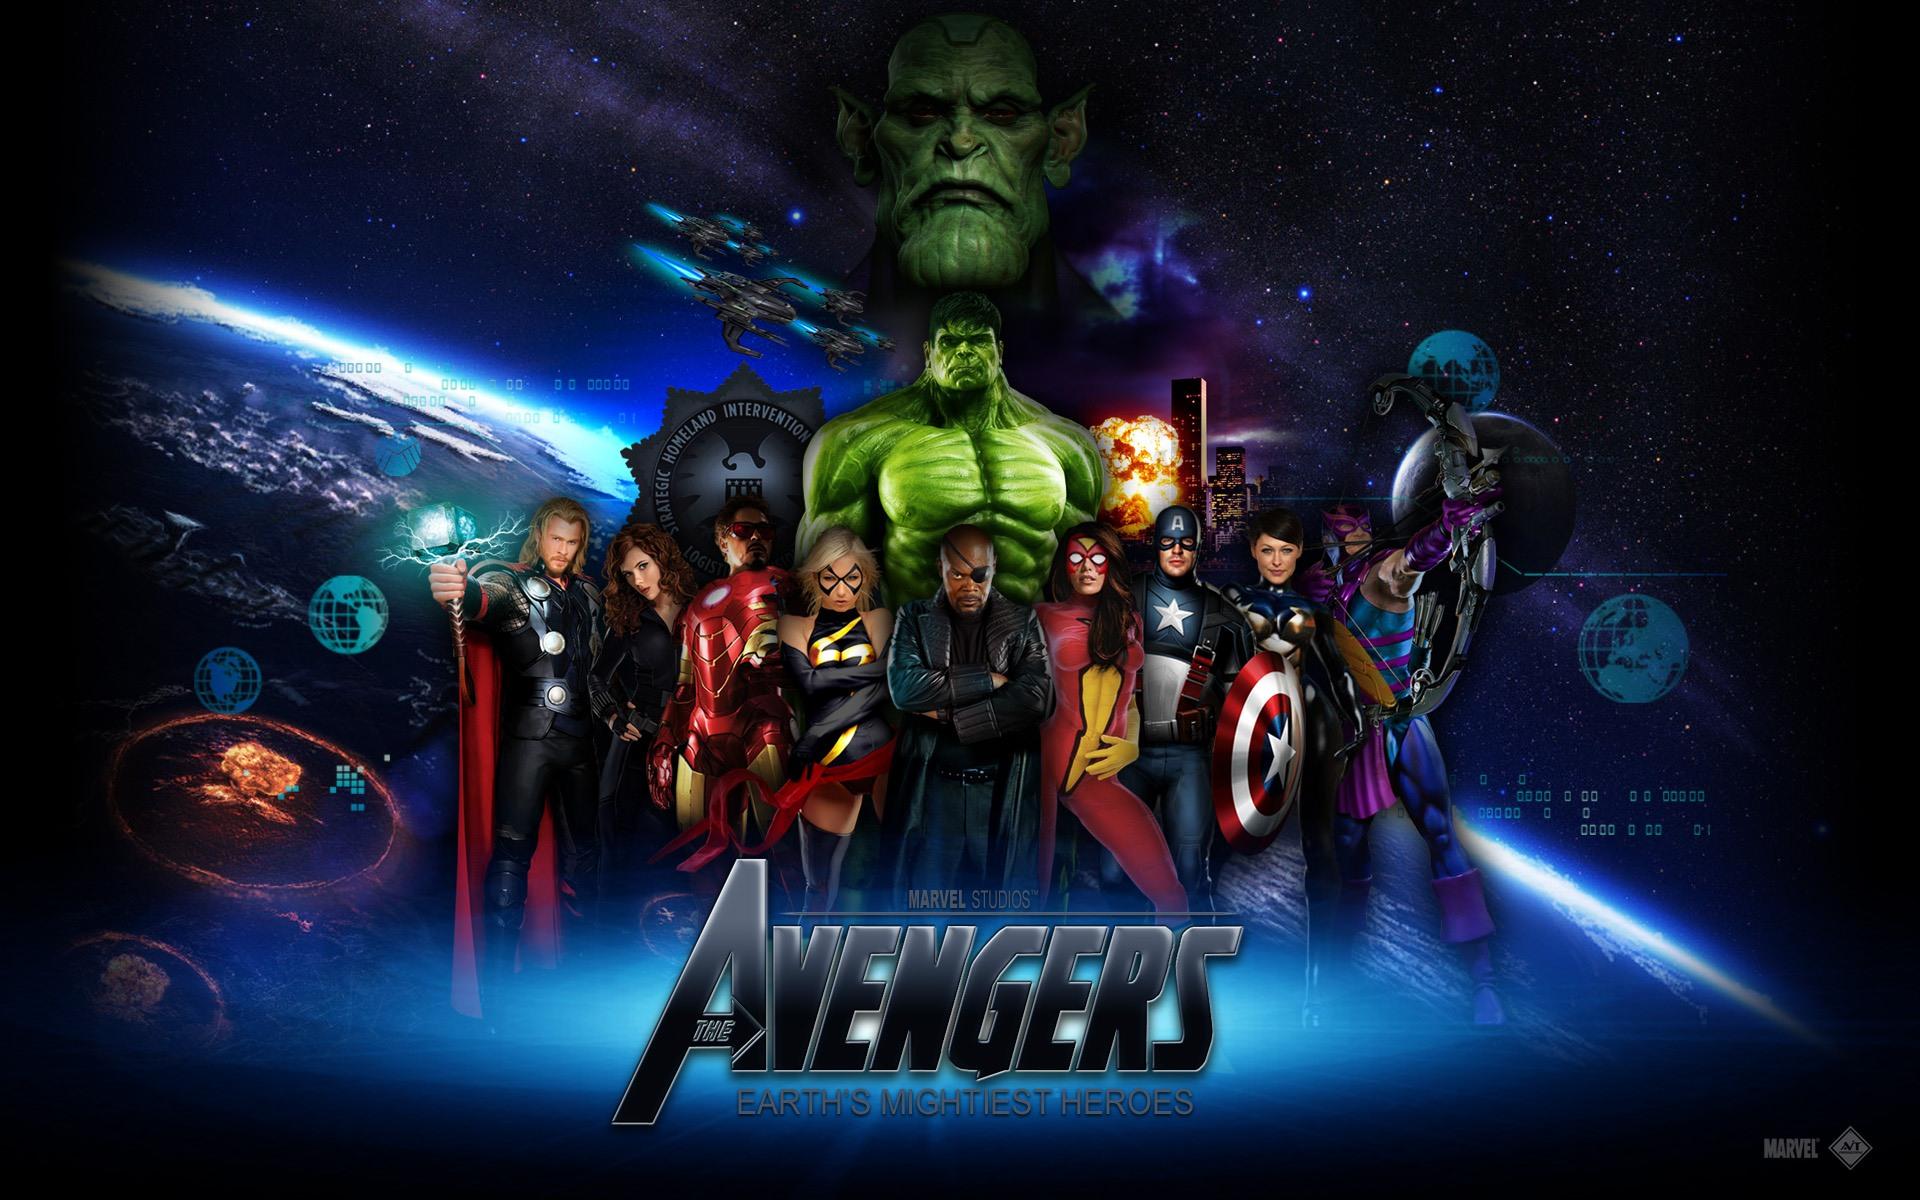 The Avengers 2 HD Wallpaper Download HD Wallpapers For Desktop 1920x1200